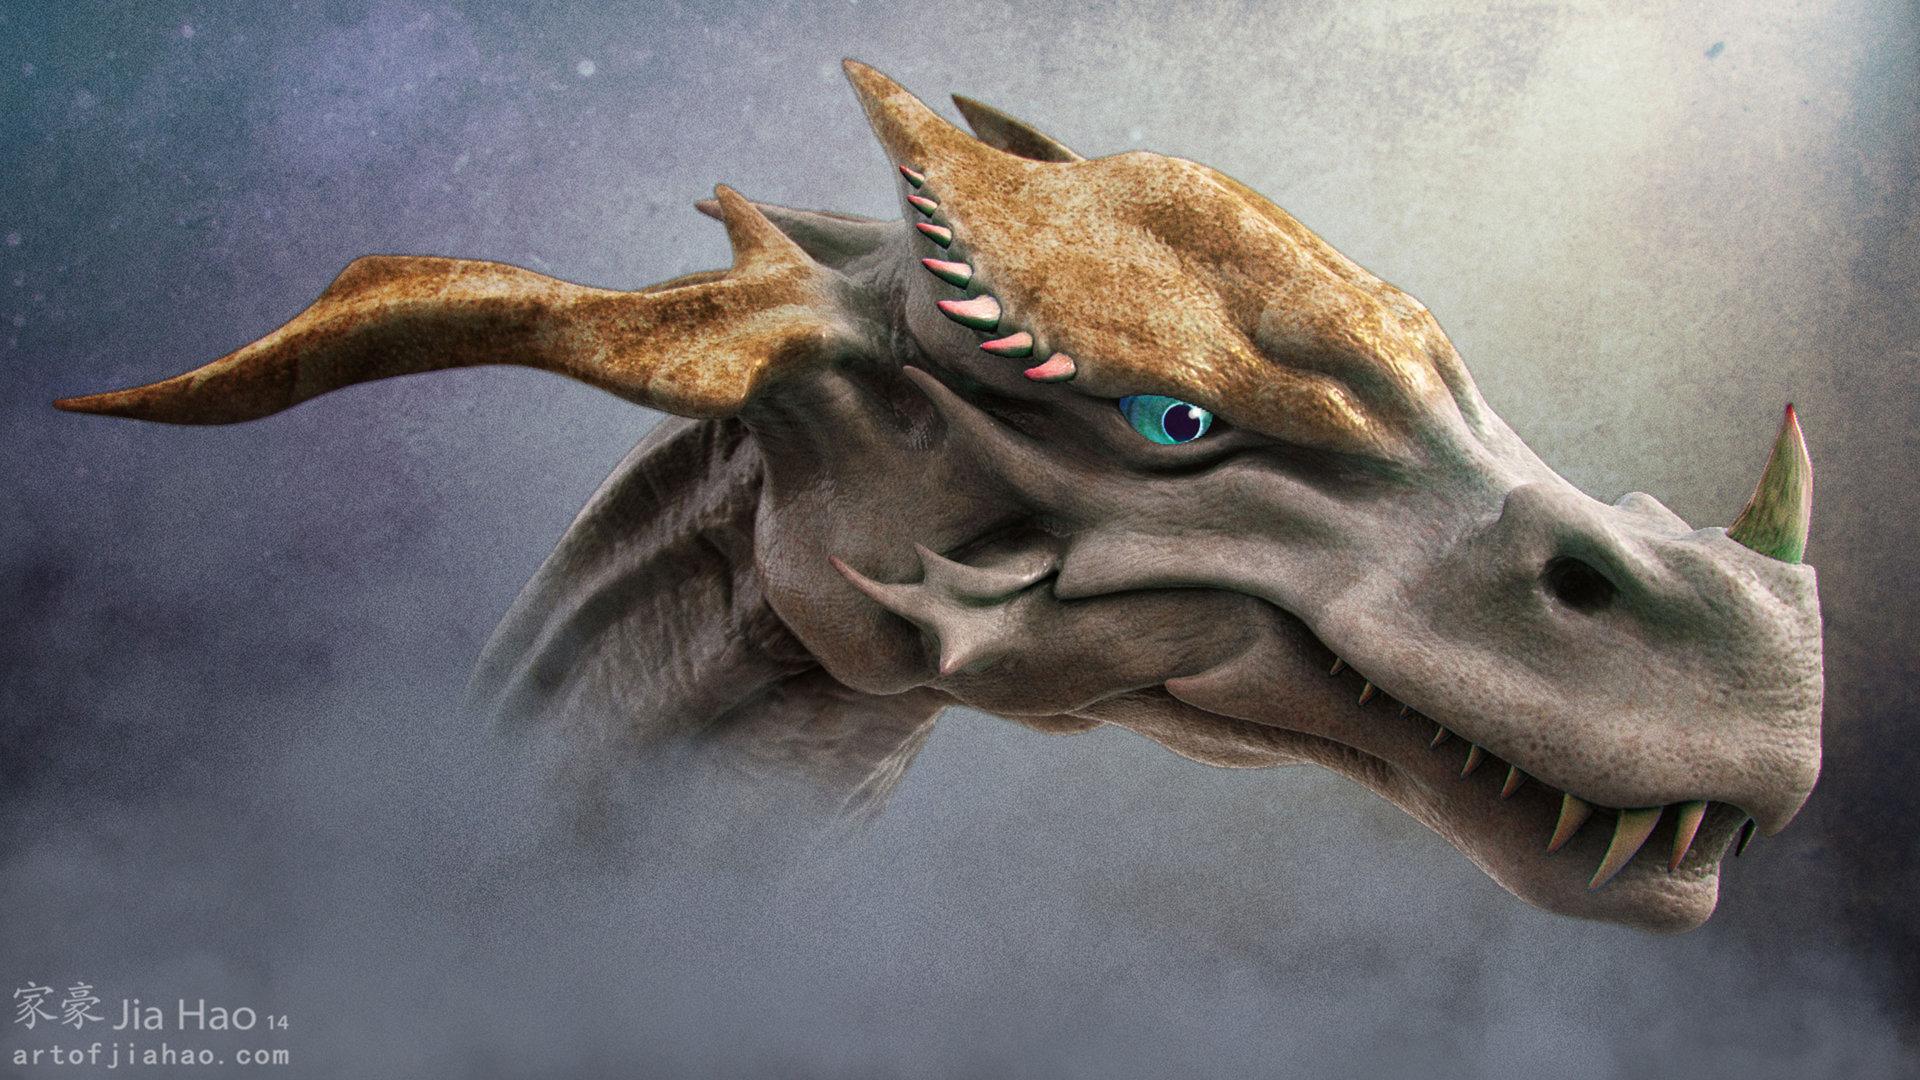 Jia hao 2014 07 dragon bust 01